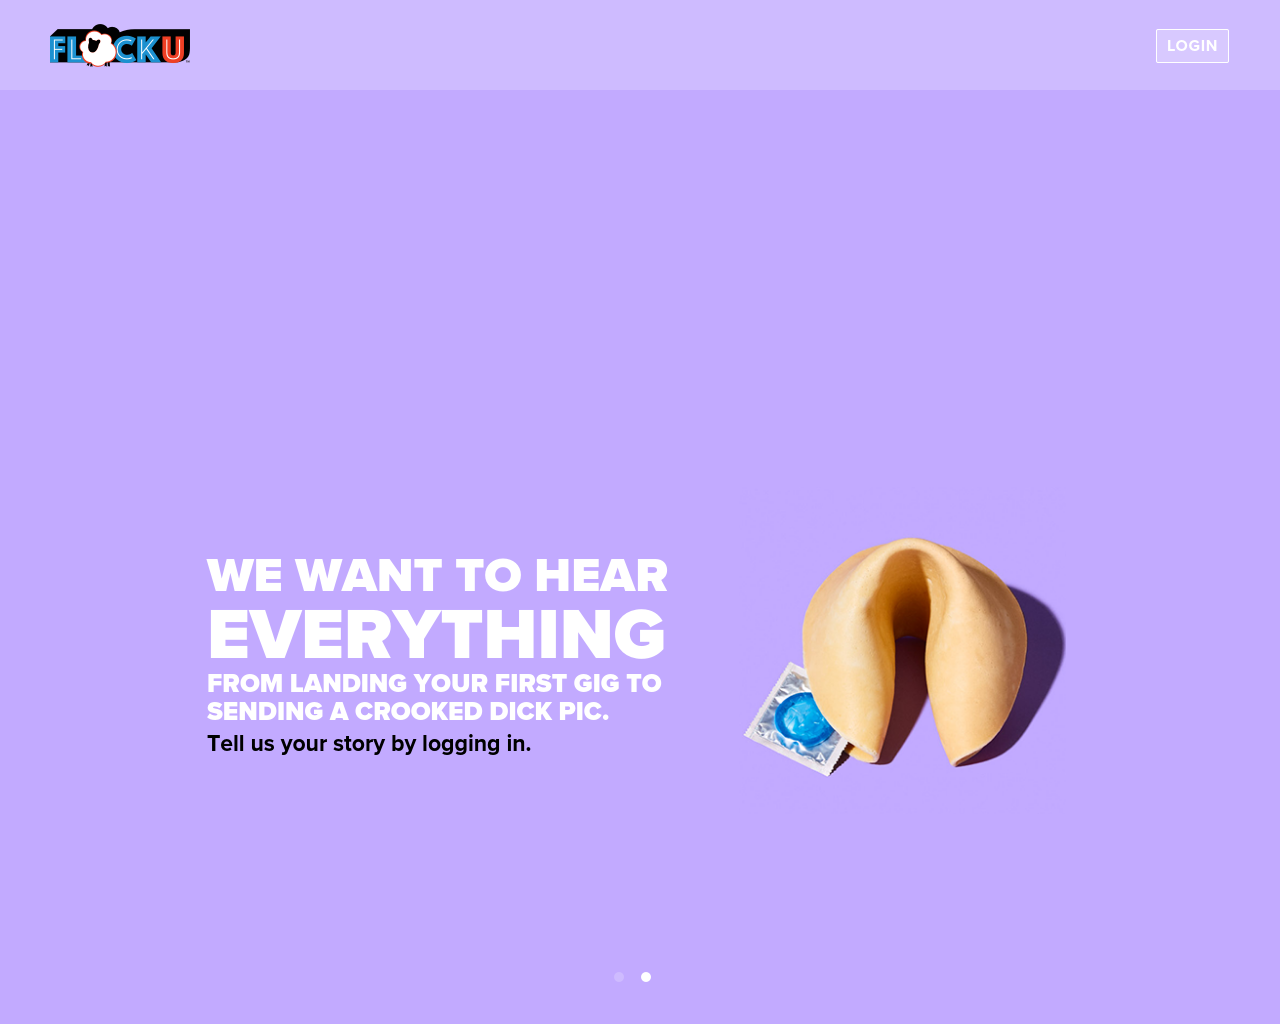 FlockU-Advertising-Reviews-Pricing